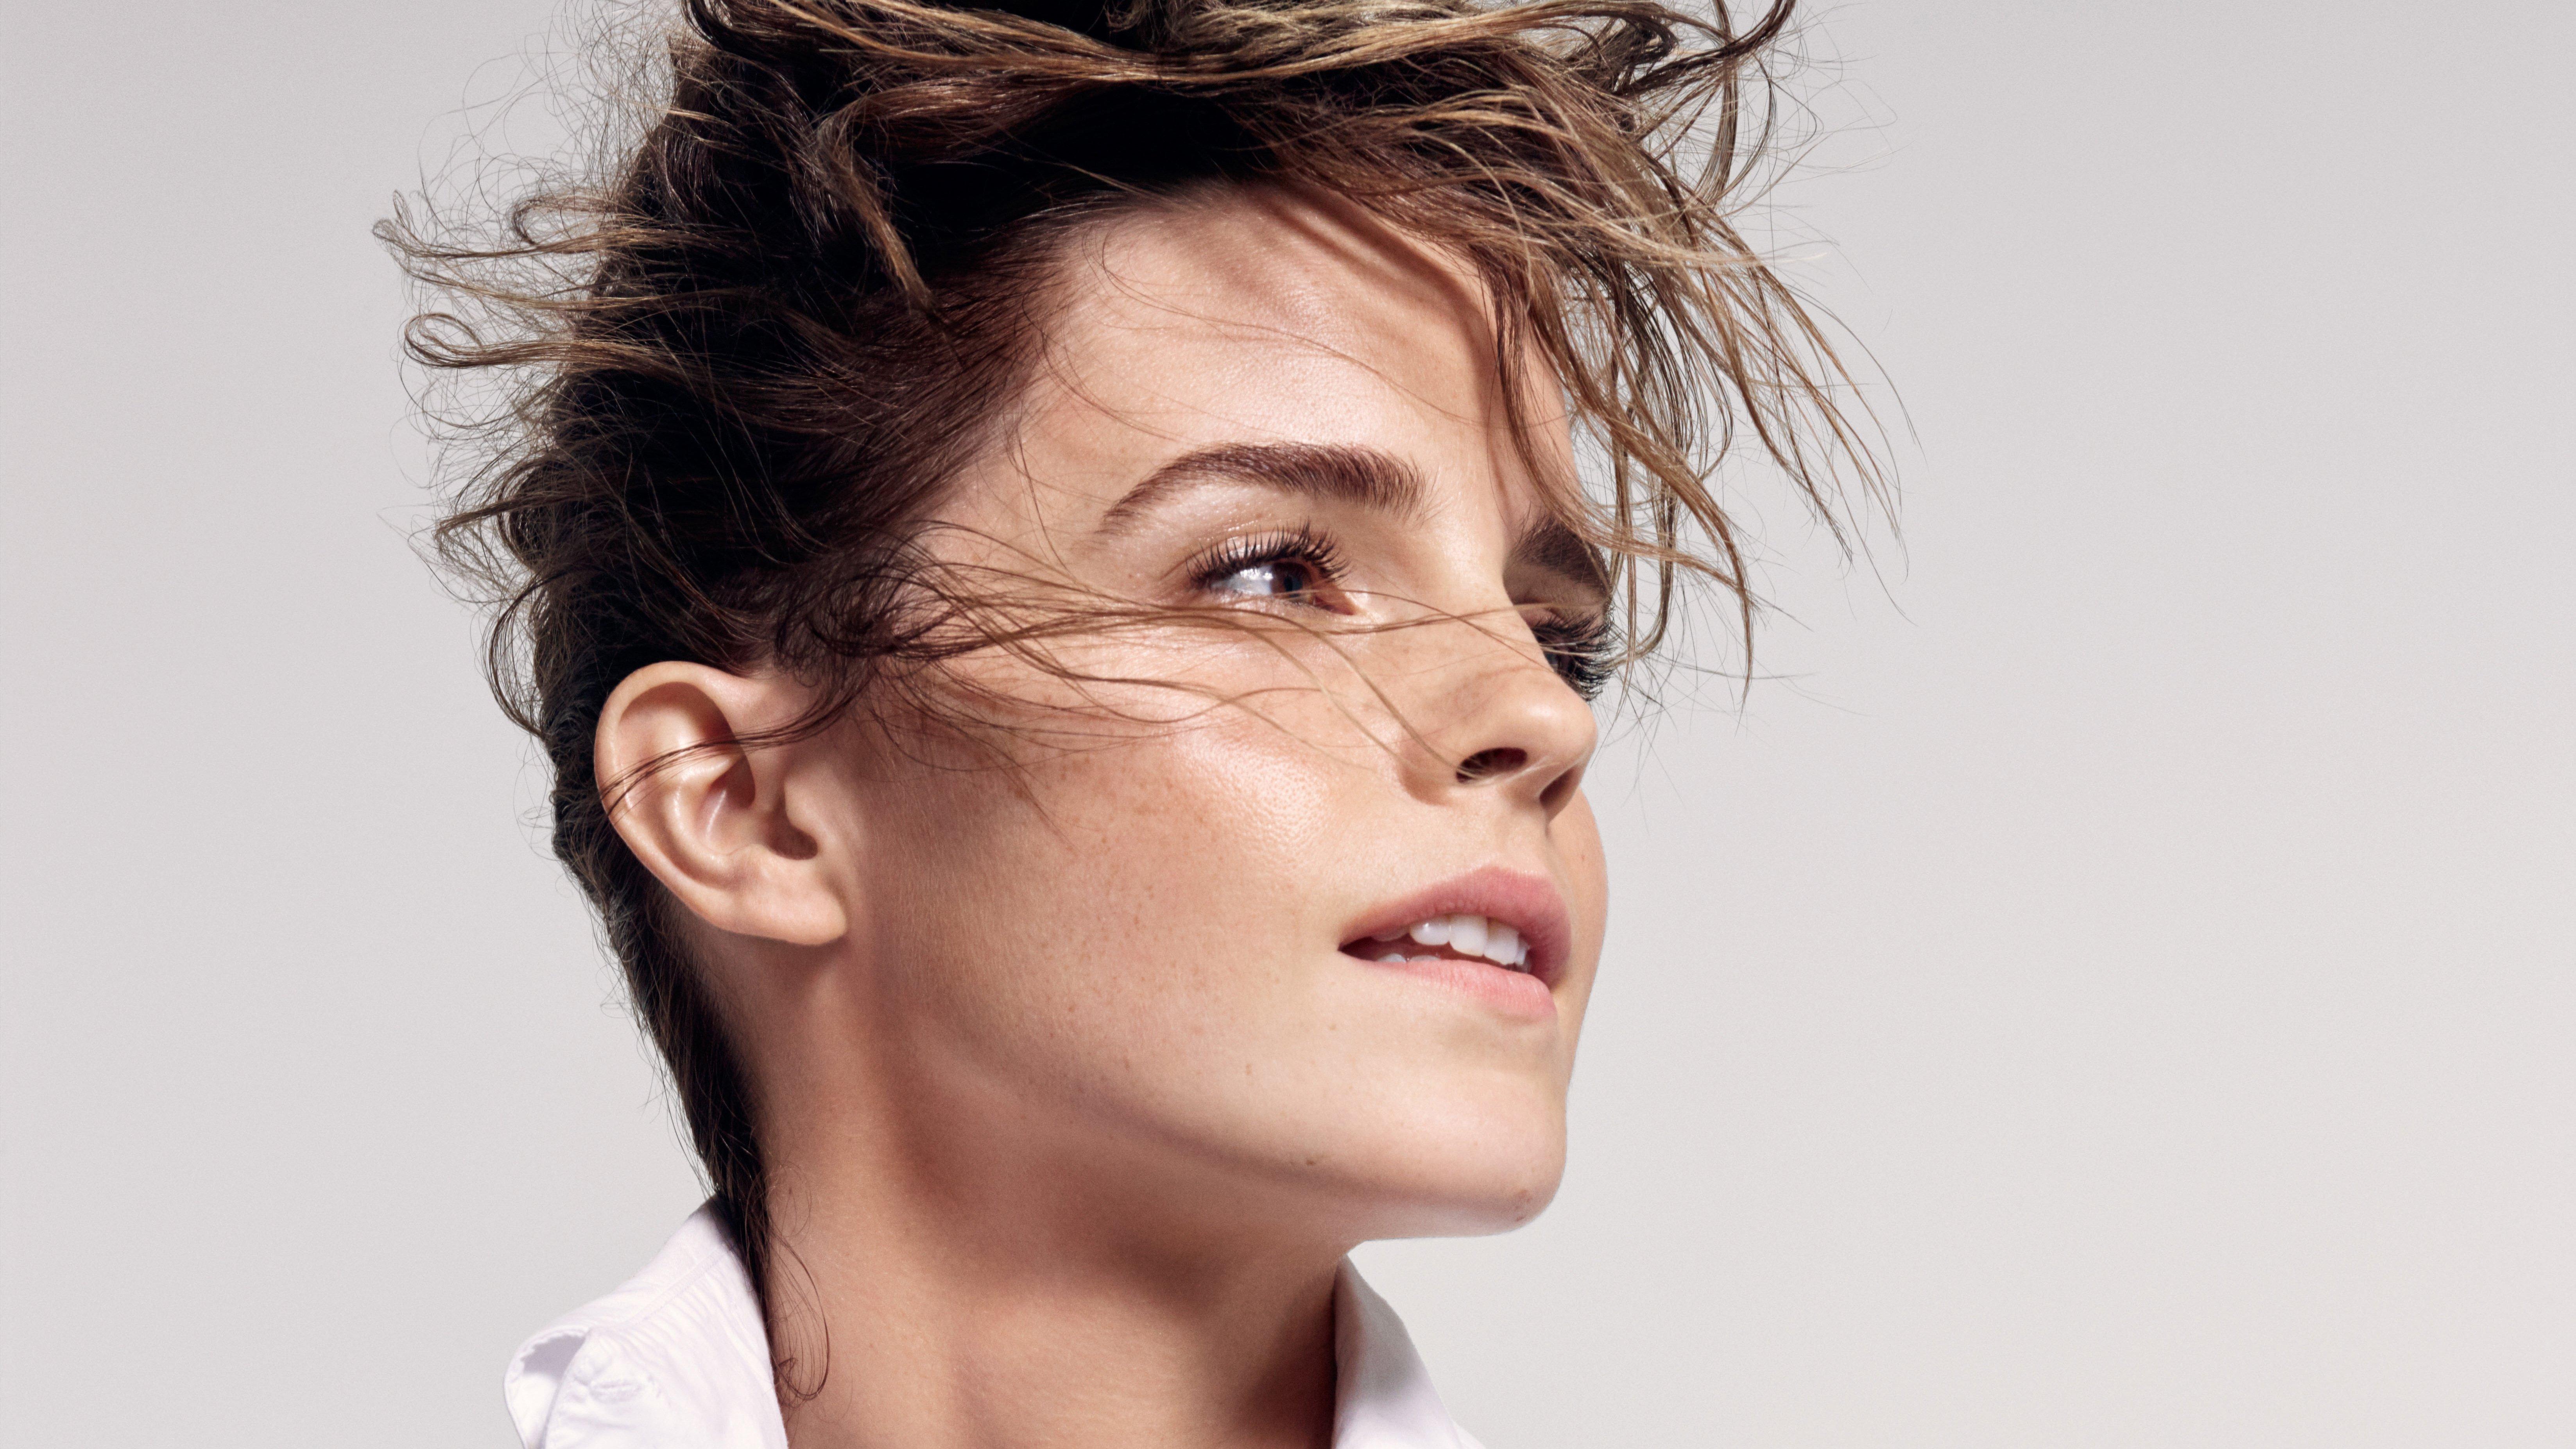 Fondos de pantalla Emma Watson cabello corto